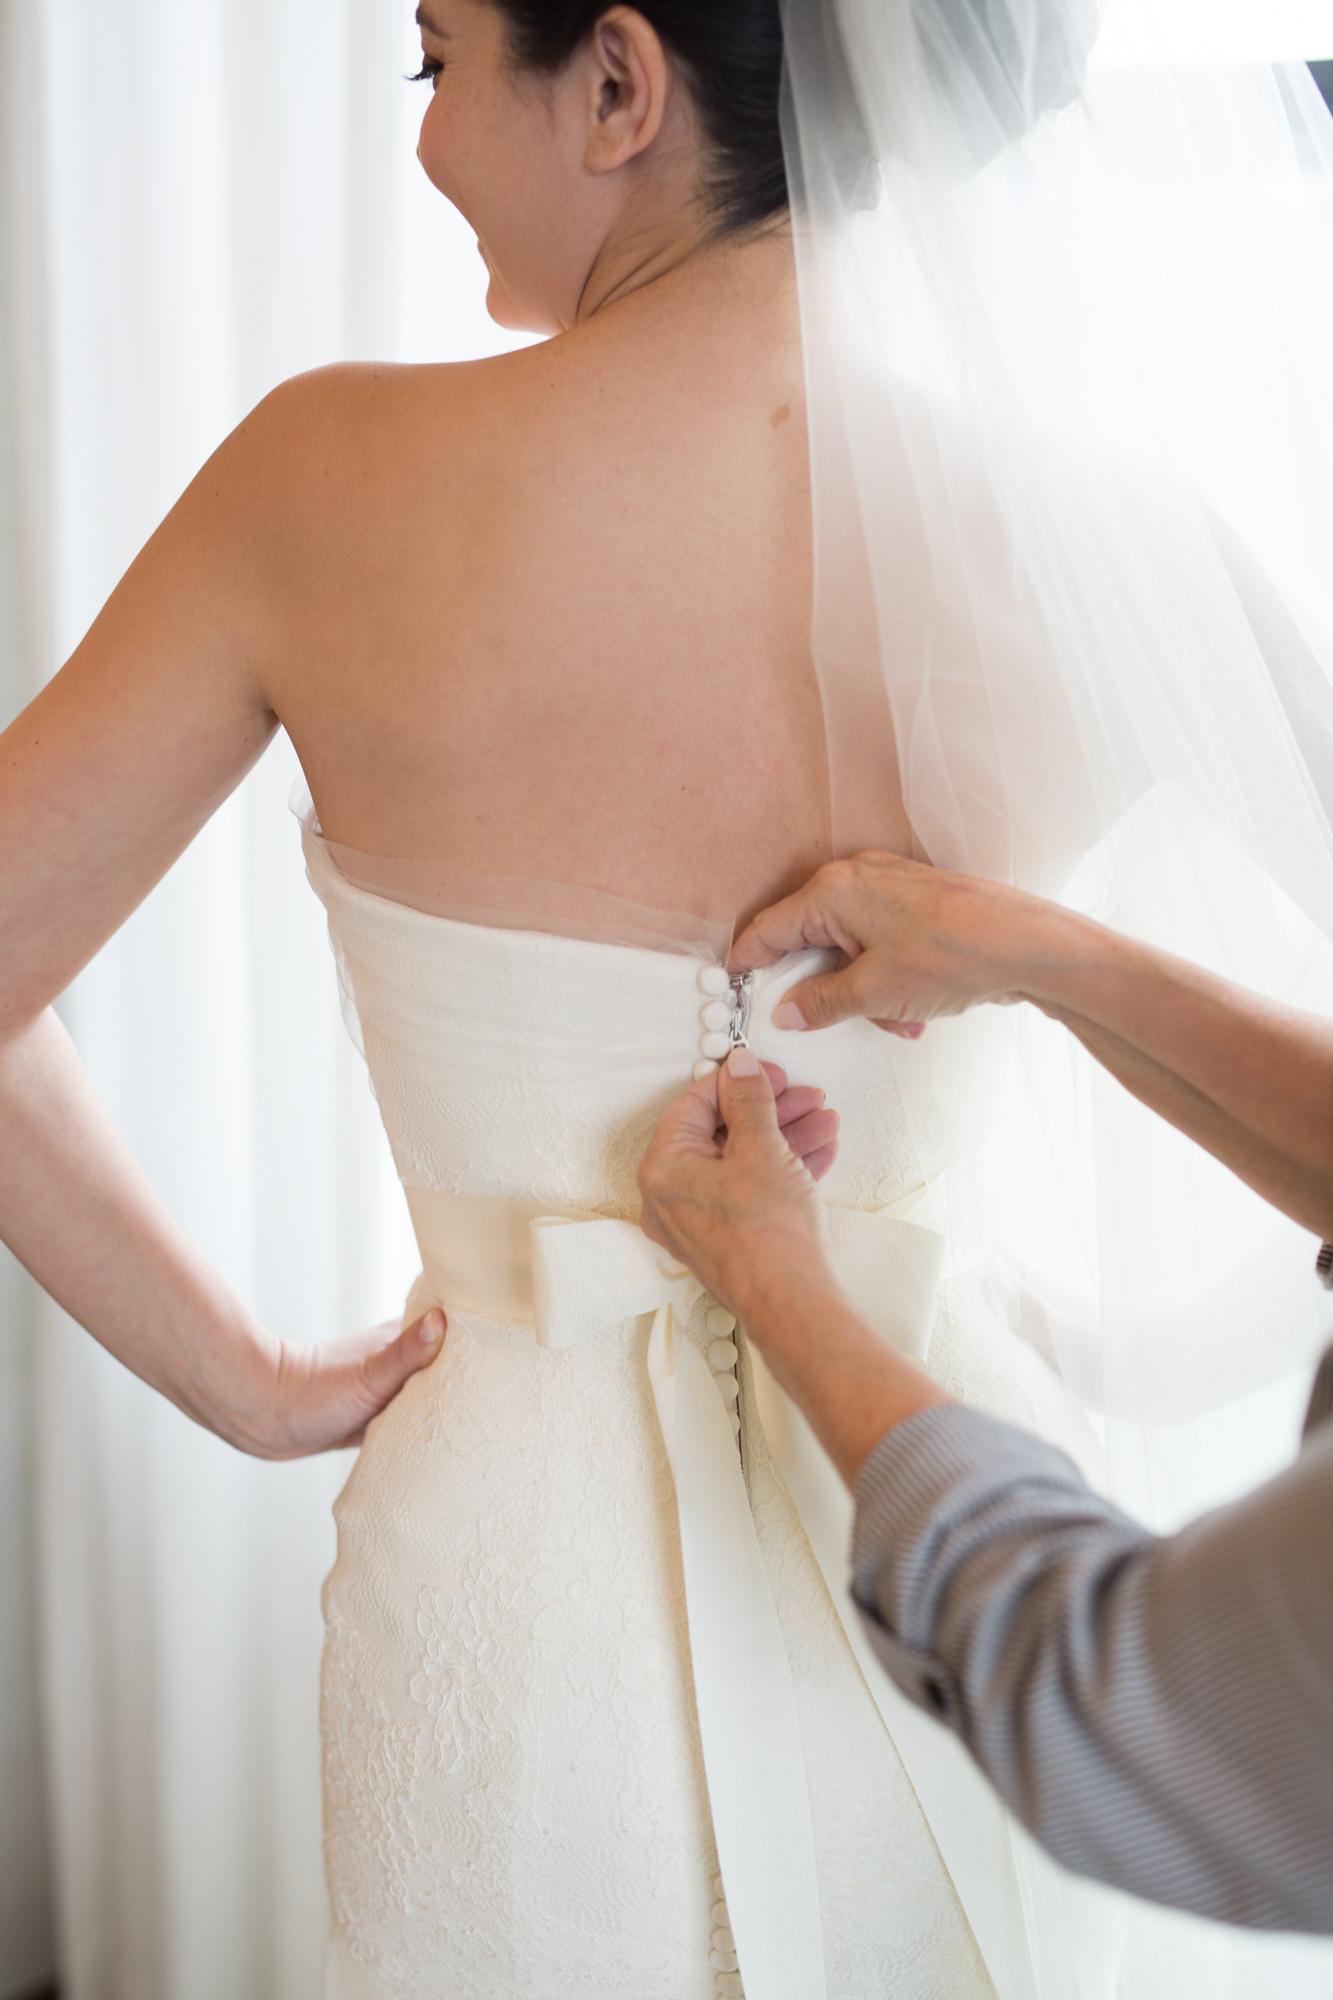 Bride gets ready for Adler Planetarium wedding at InterContinental Chicago